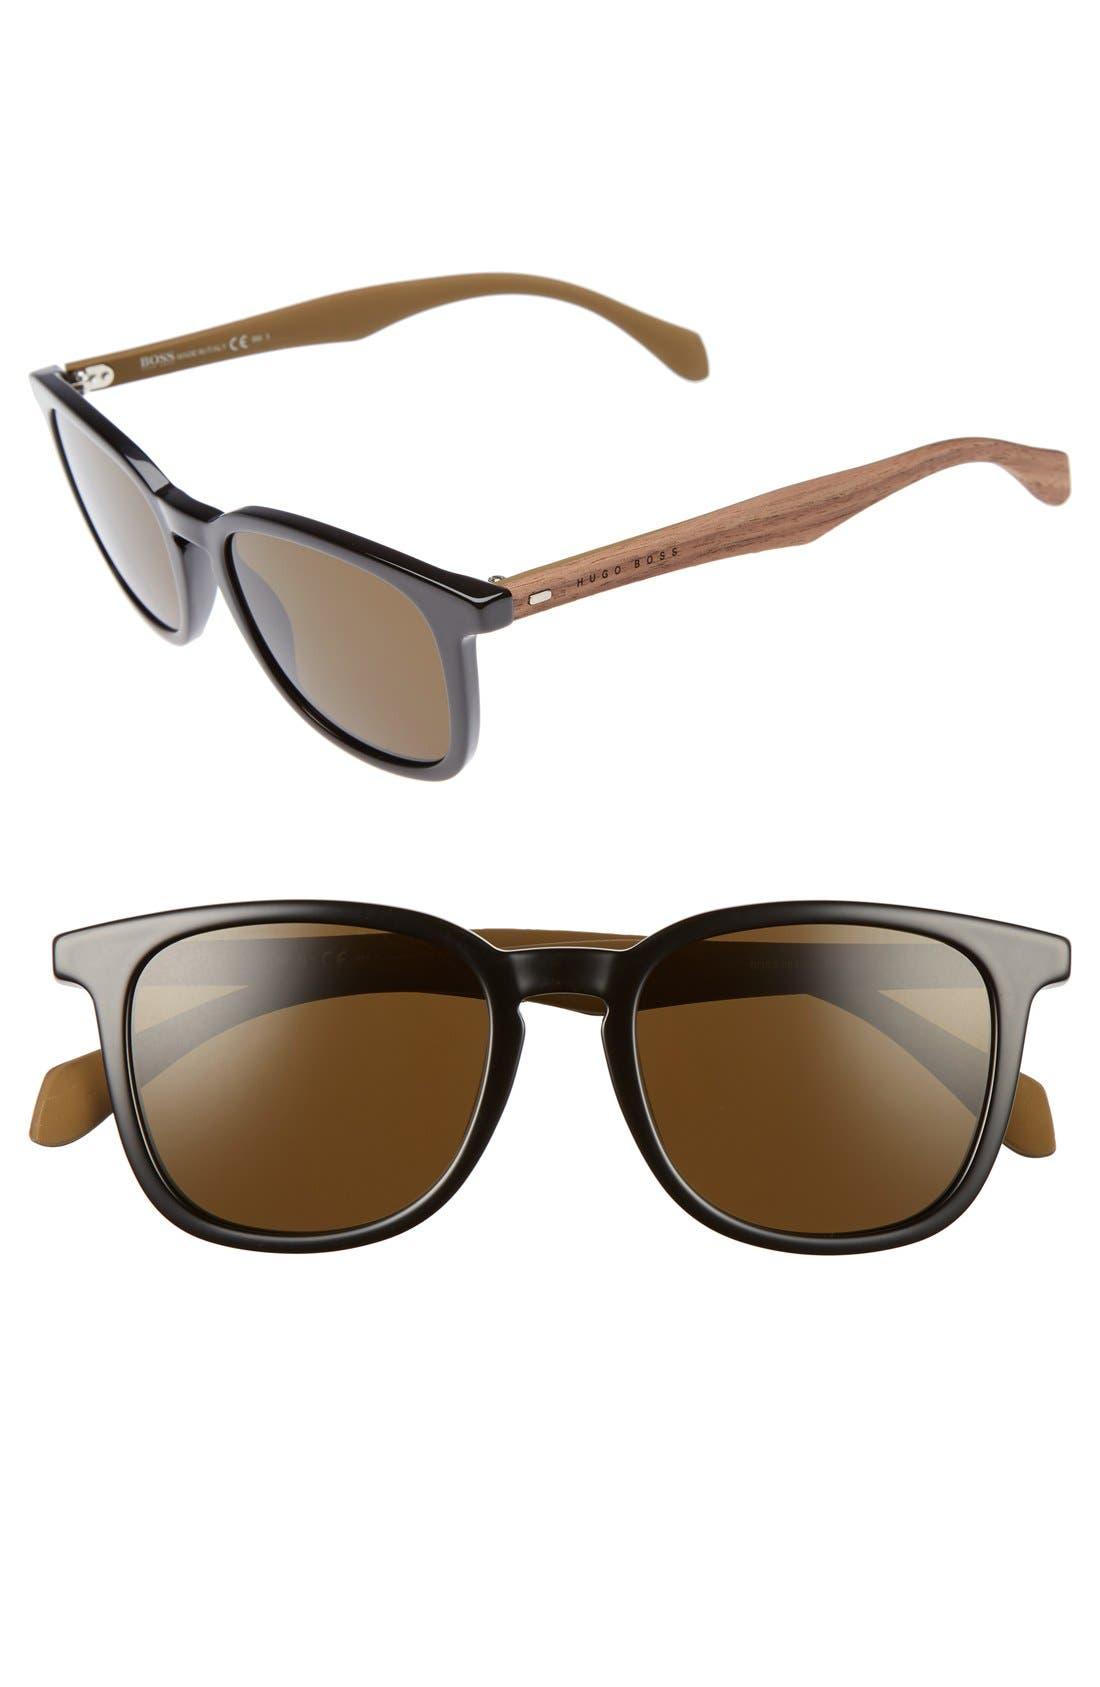 843/S 52mm Sunglasses,                             Main thumbnail 1, color,